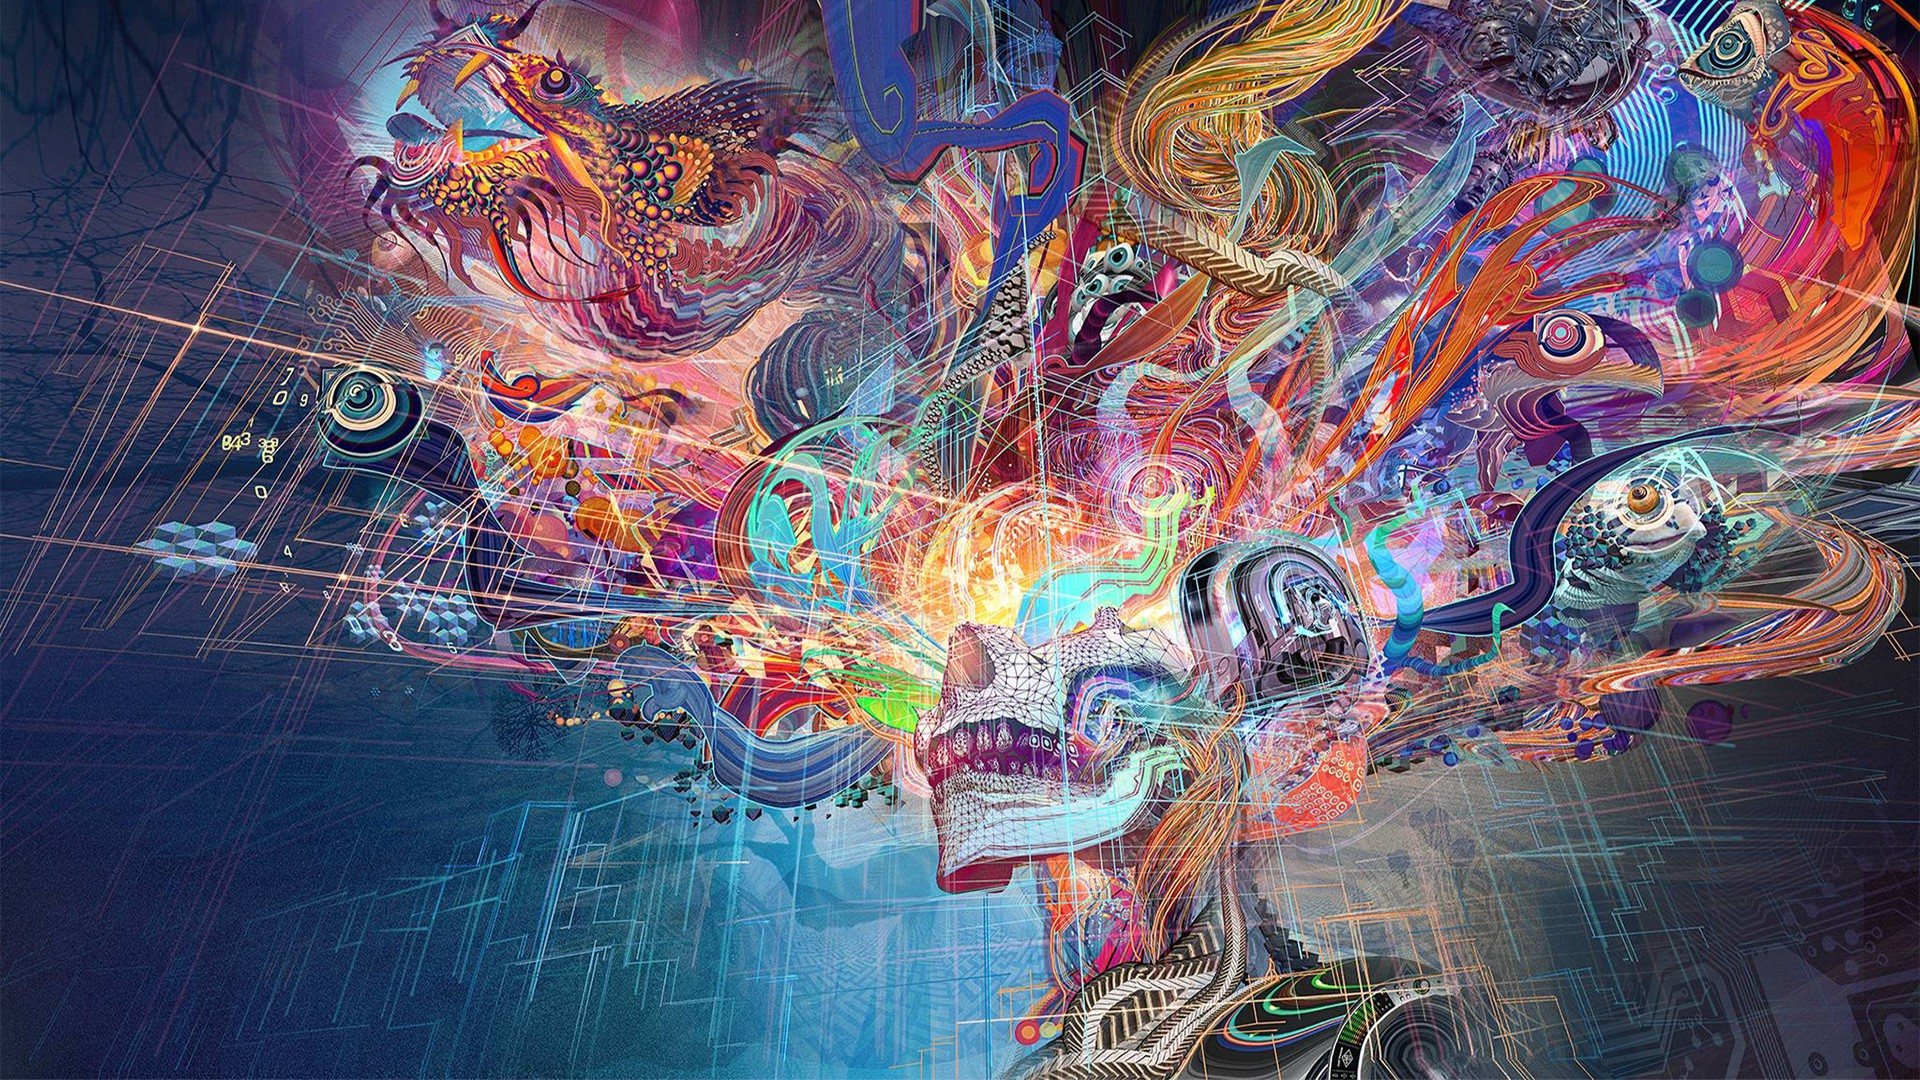 General 1920x1080 fantasy art colorful chinese dragon digital art abstract skull